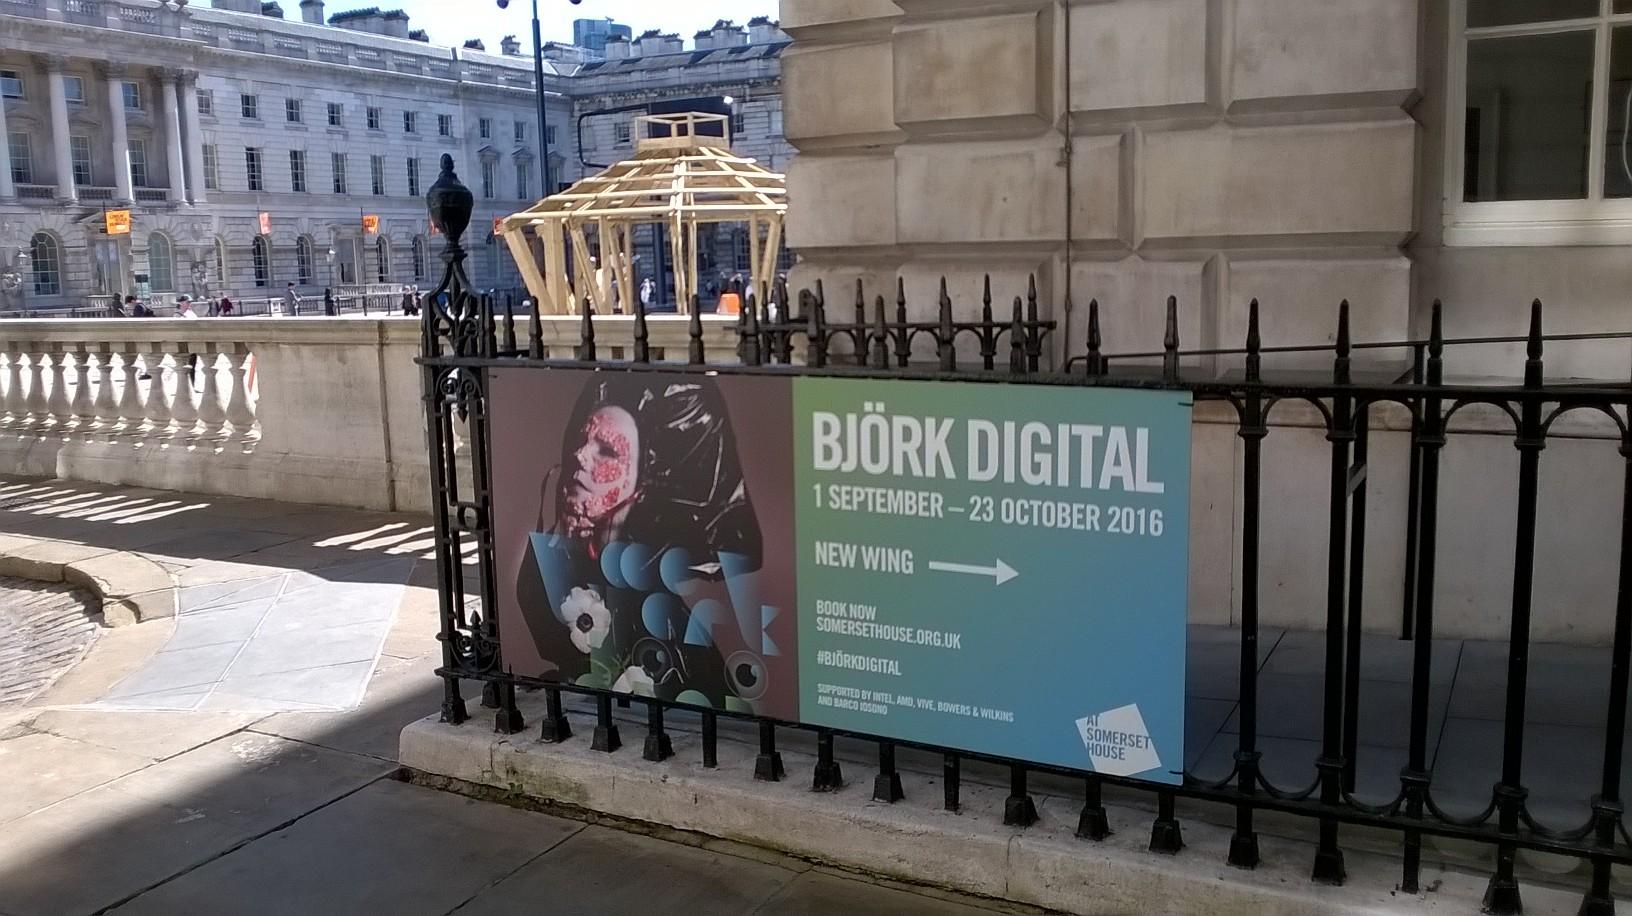 Bjork Digital